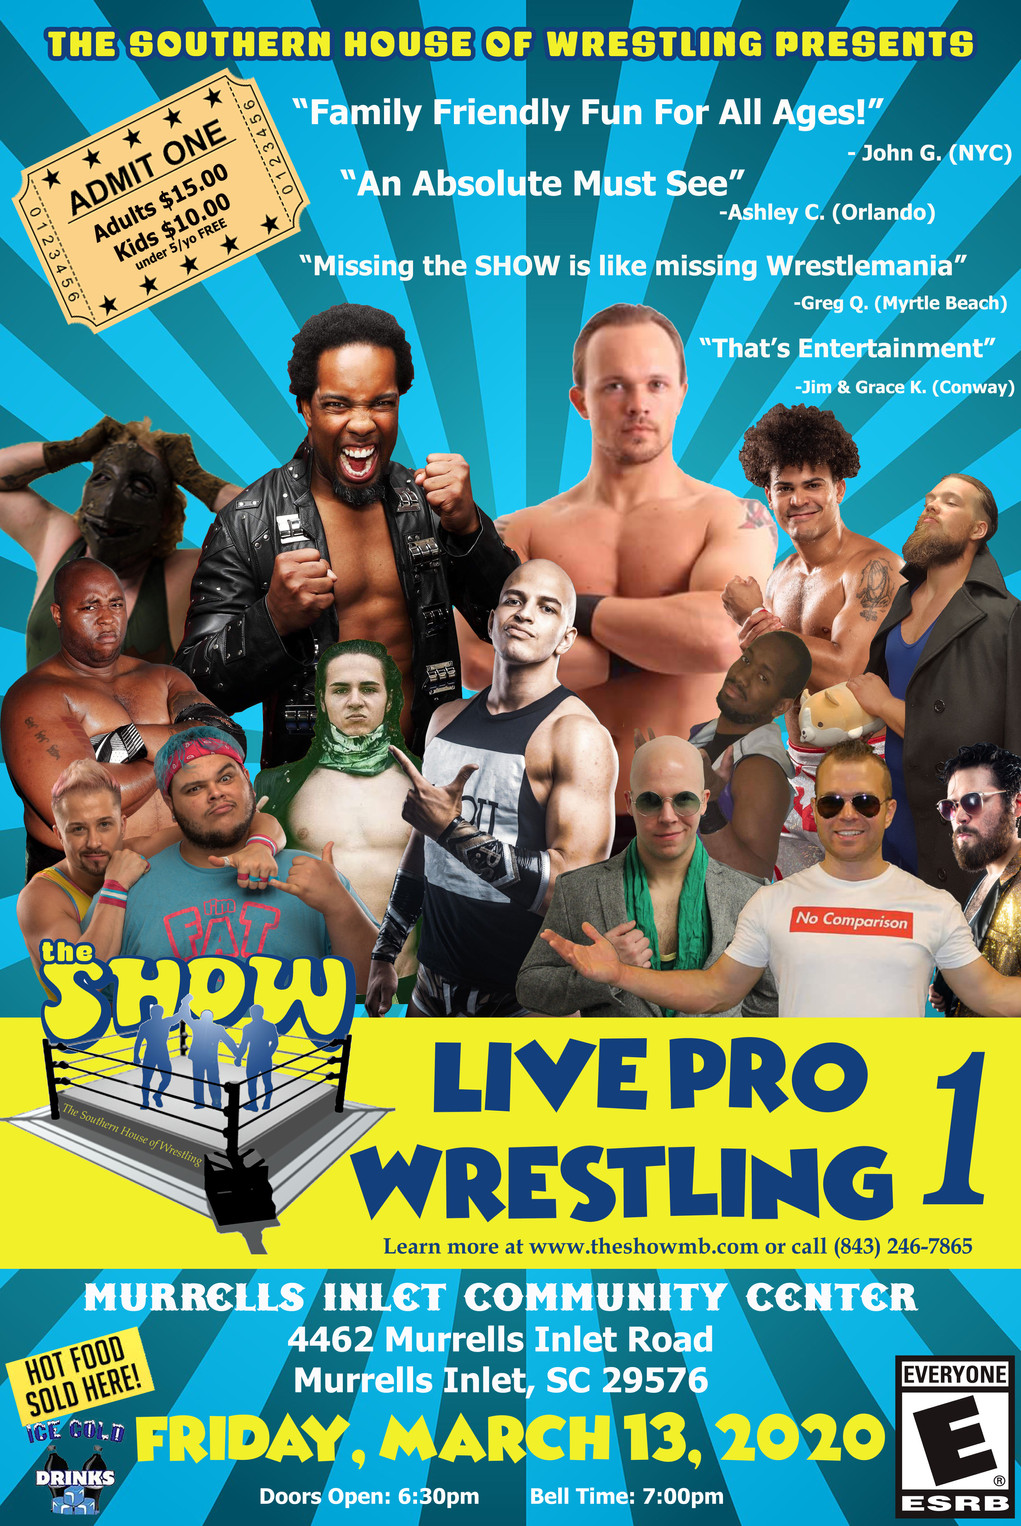 Live Pro Wrestling March 13 2020.jpg